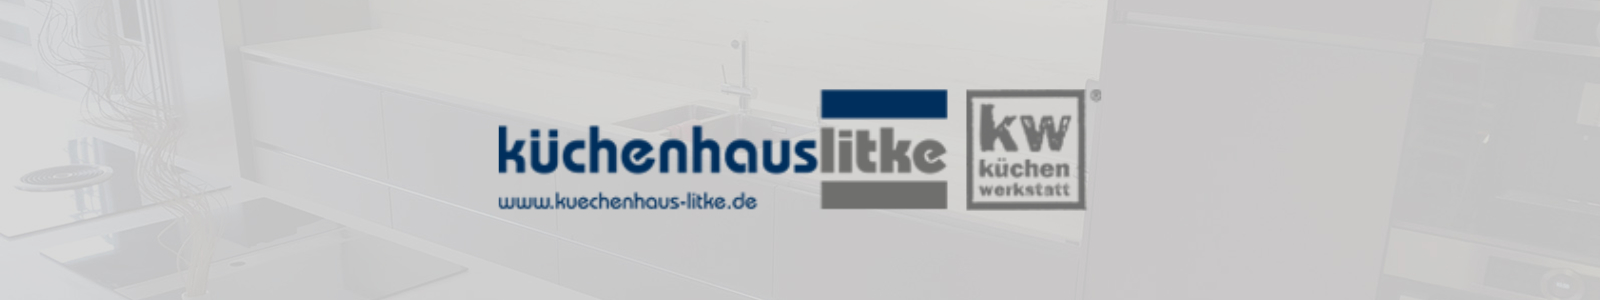 Küchenhaus Litke Altenburg kuechenguide.com